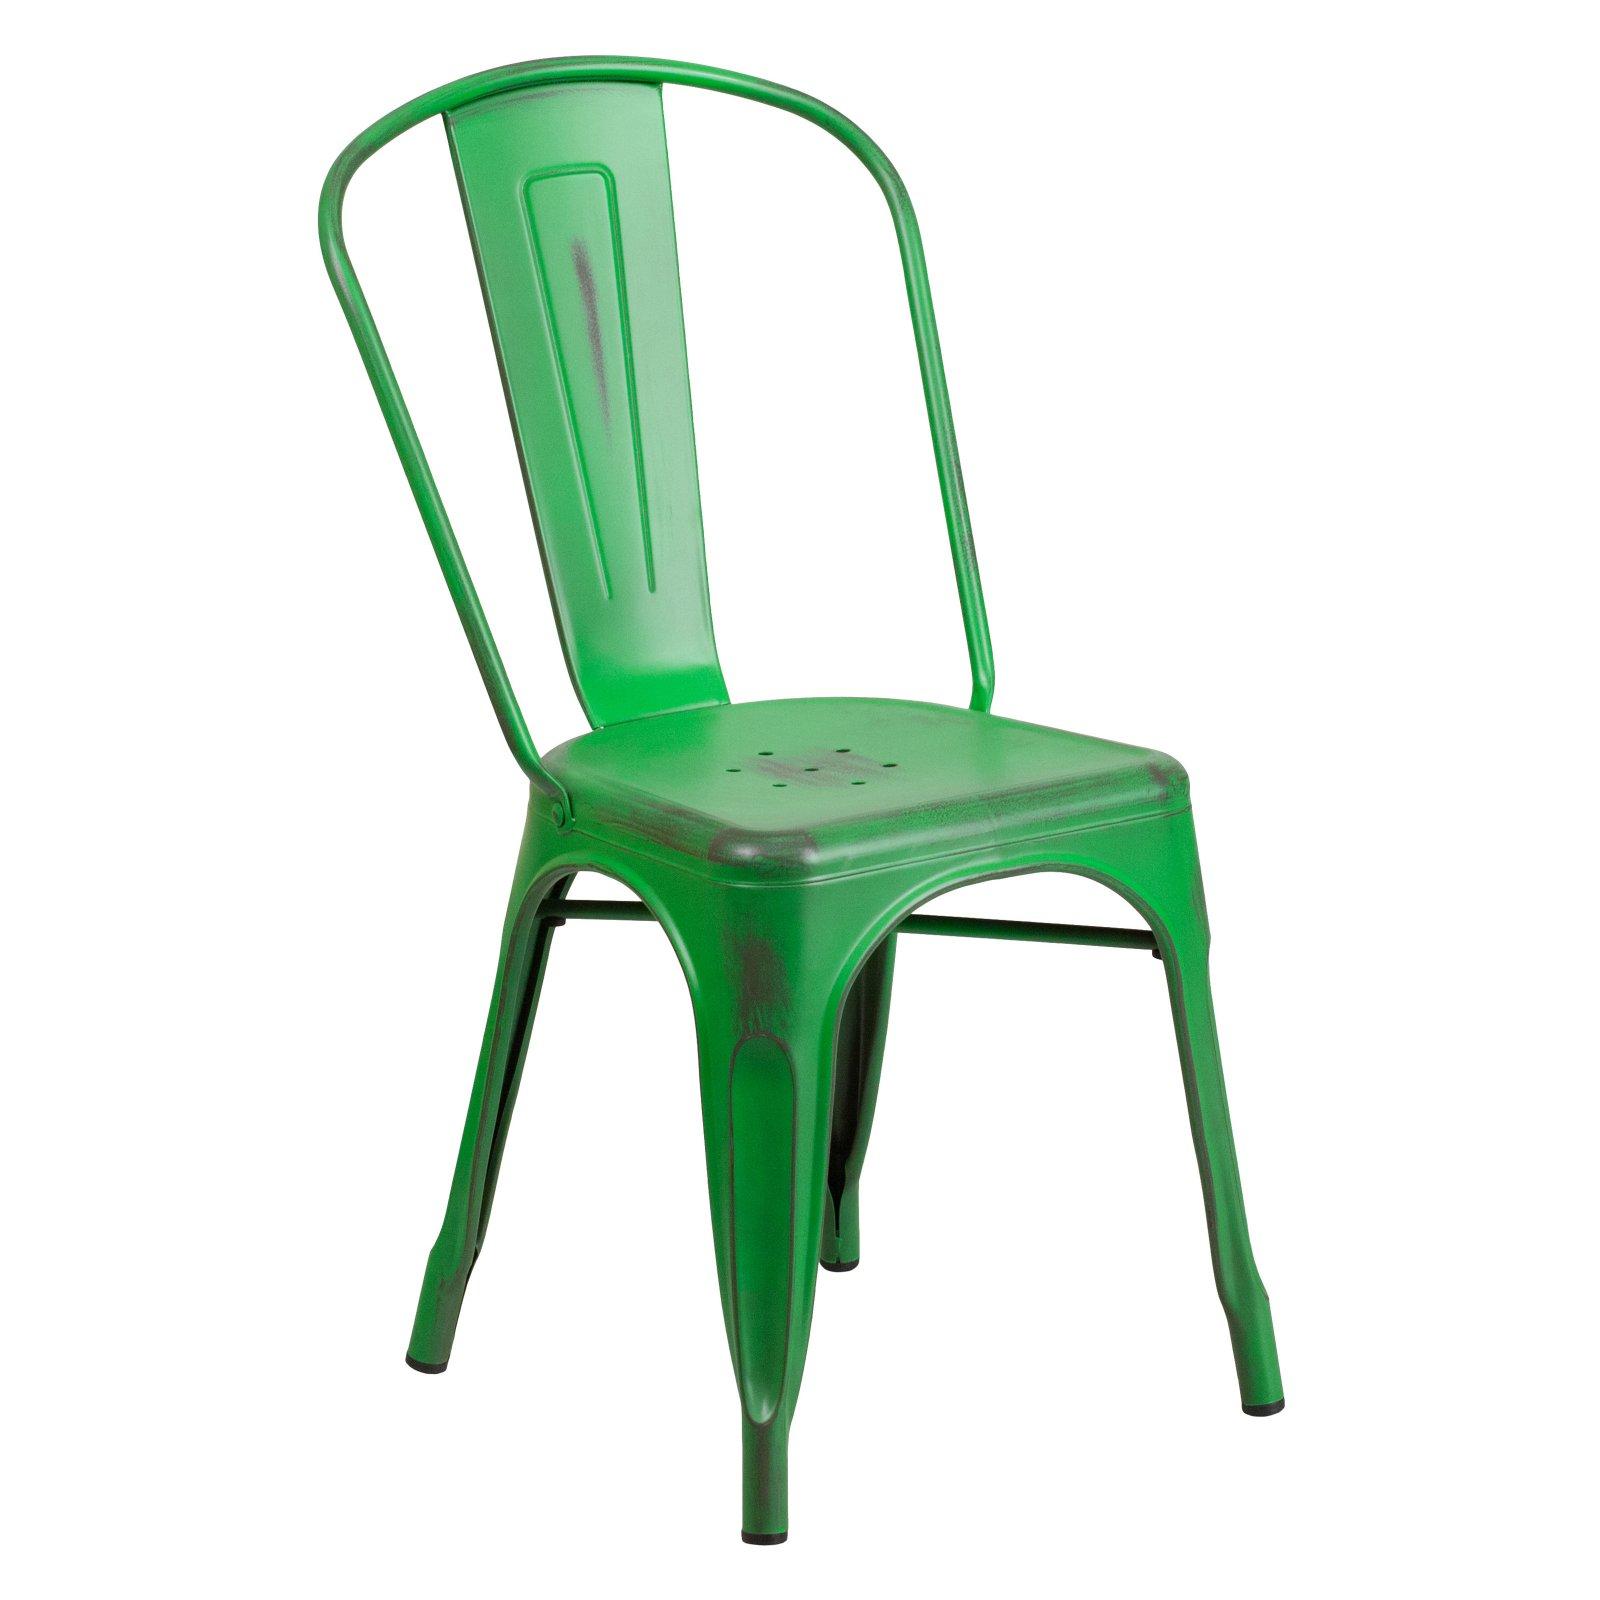 Flash Furniture Distressed Metal Indoor-Outdoor Stackable Chair Multiple Colors